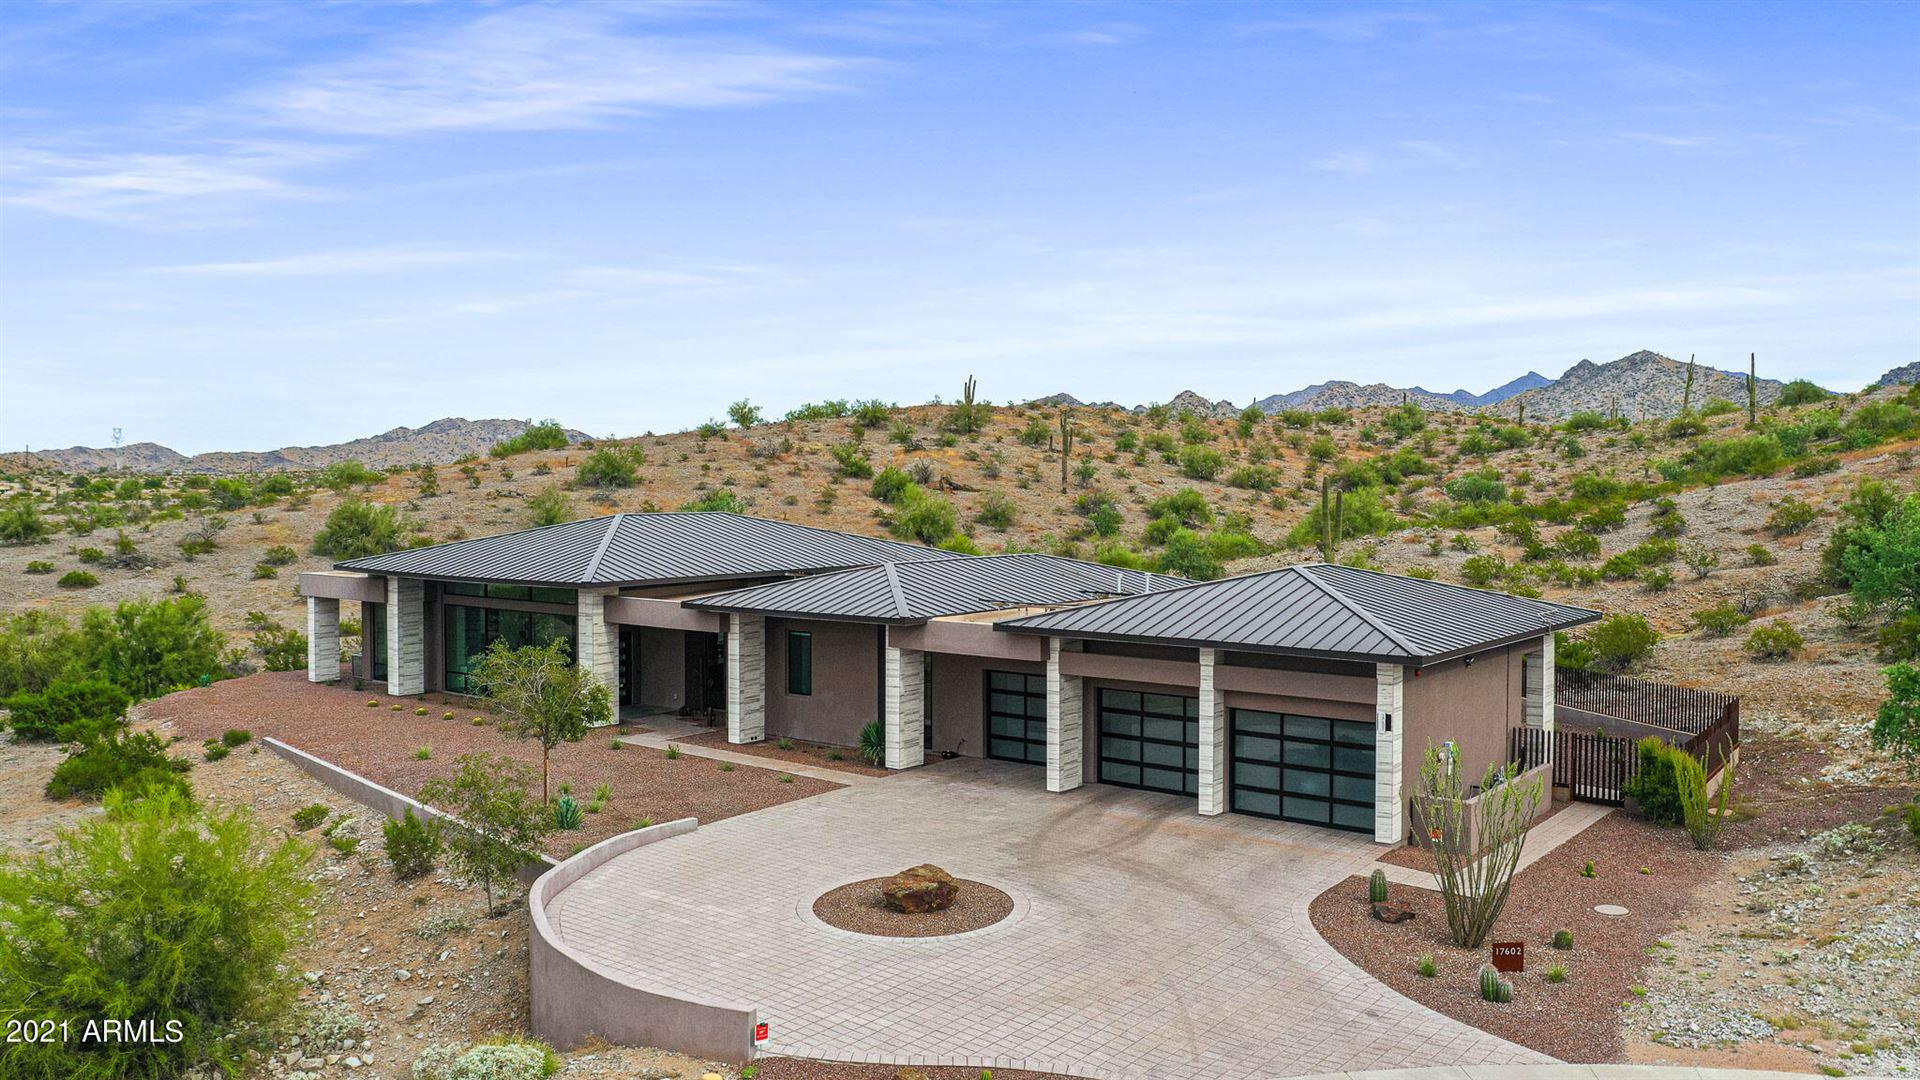 Photo of 17602 W PASEO Way, Goodyear, AZ 85338 (MLS # 6305262)